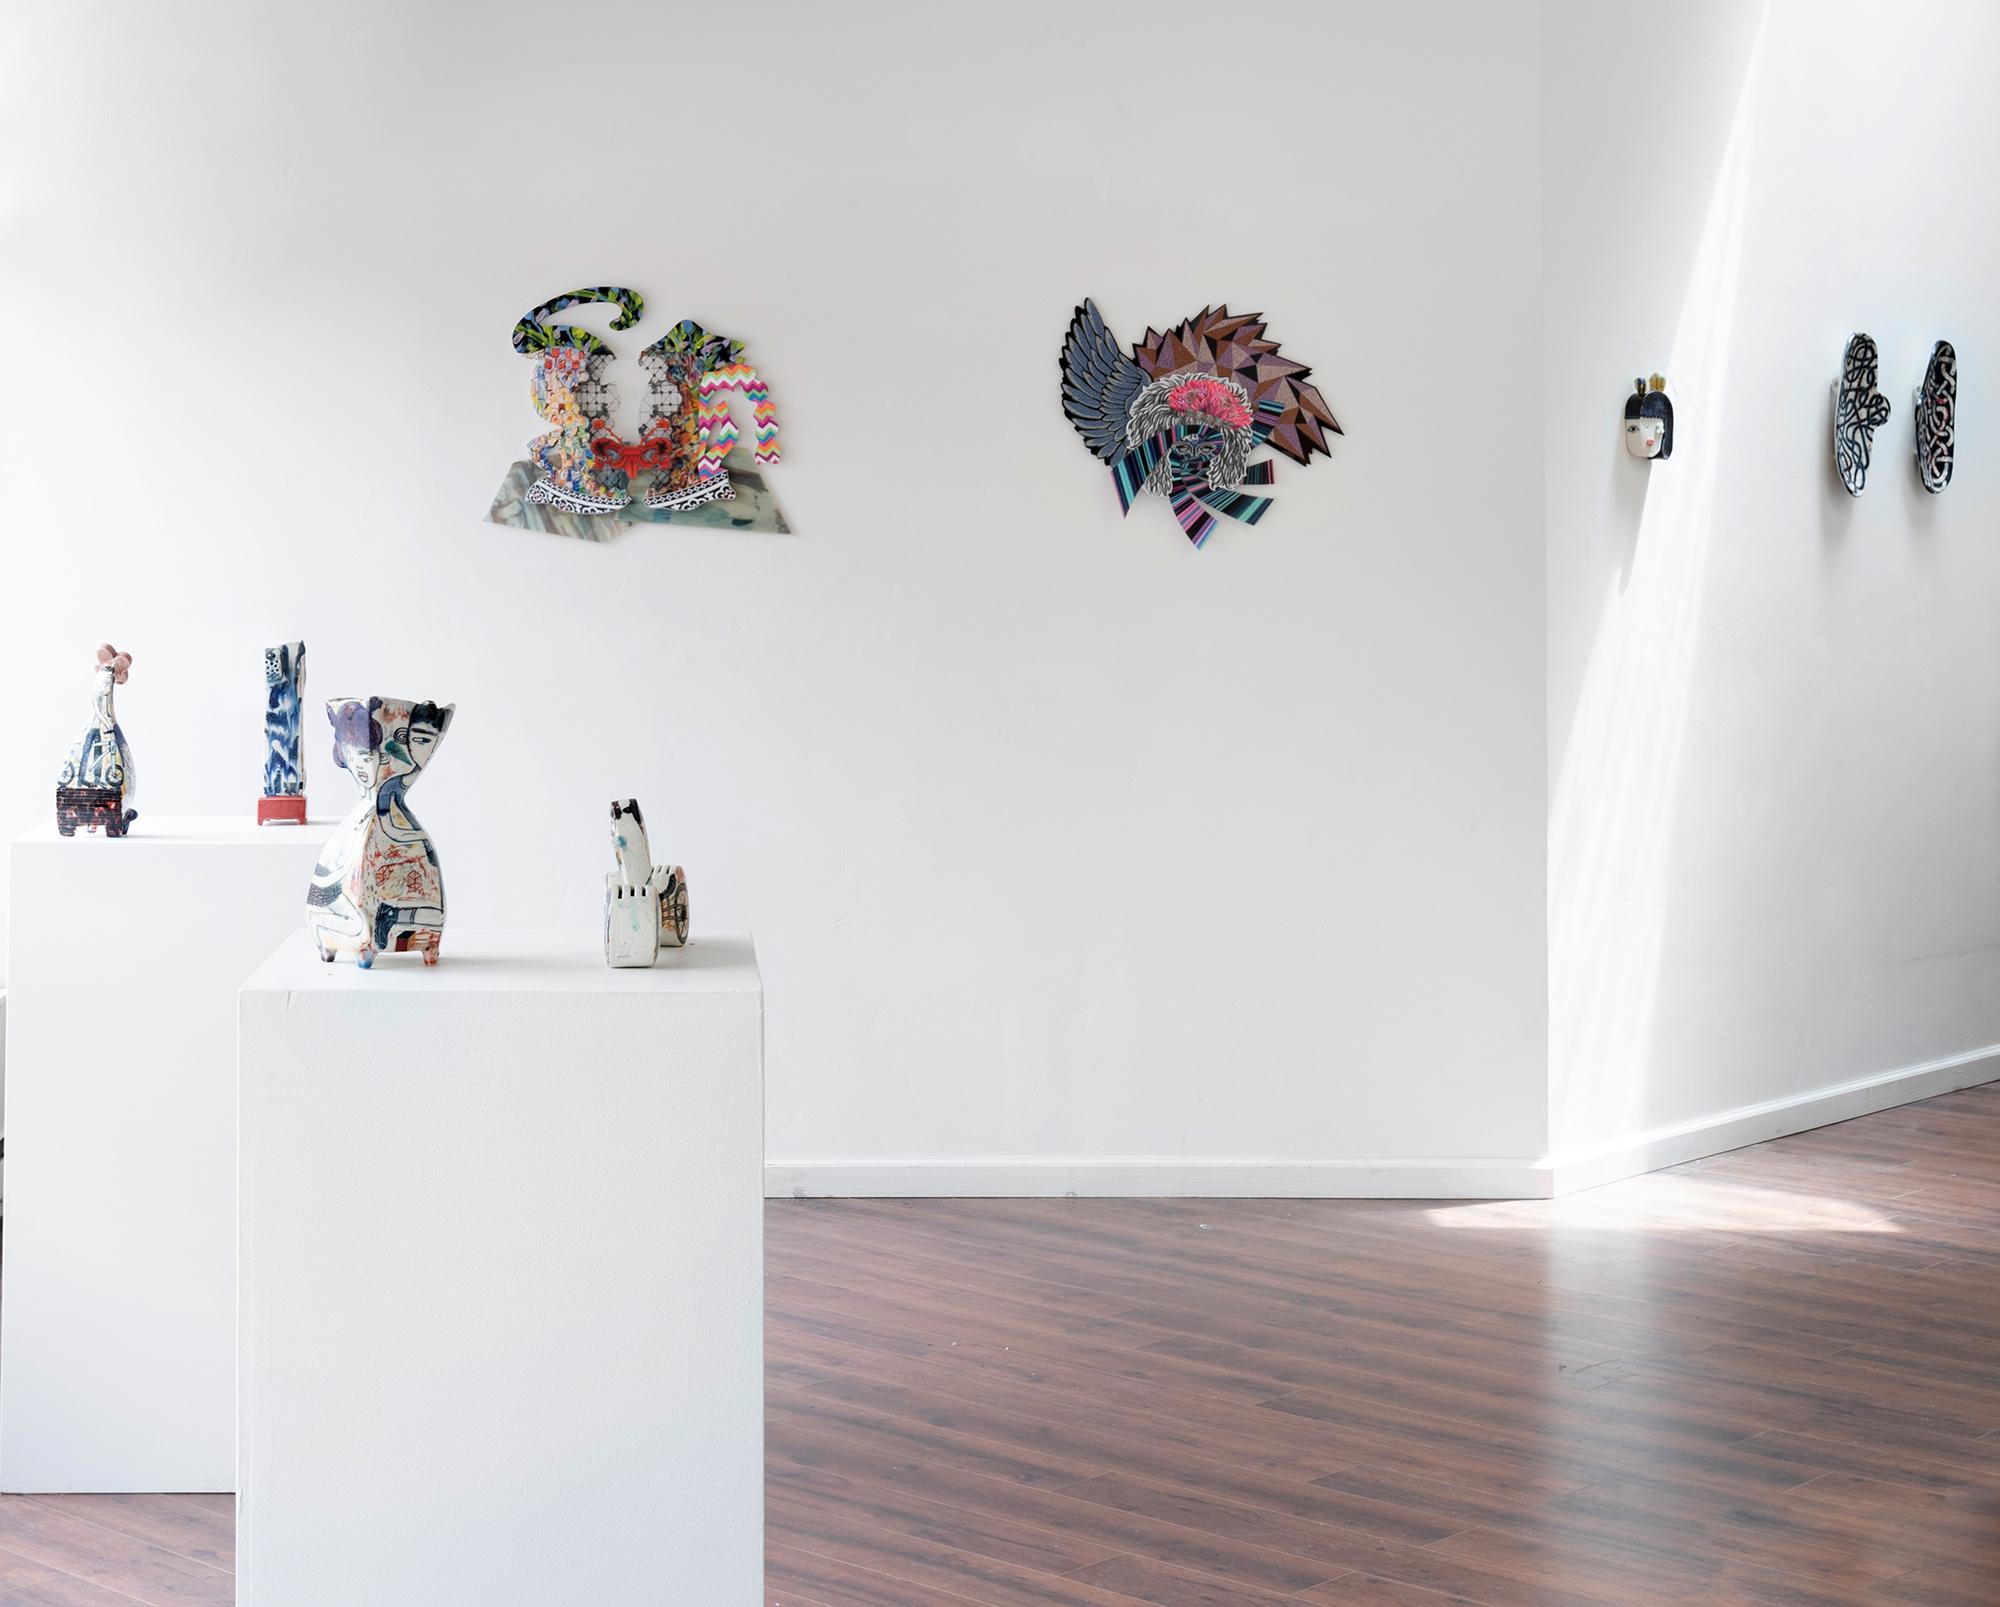 Installation view (Pamela Joseph, Kevin Snipes)